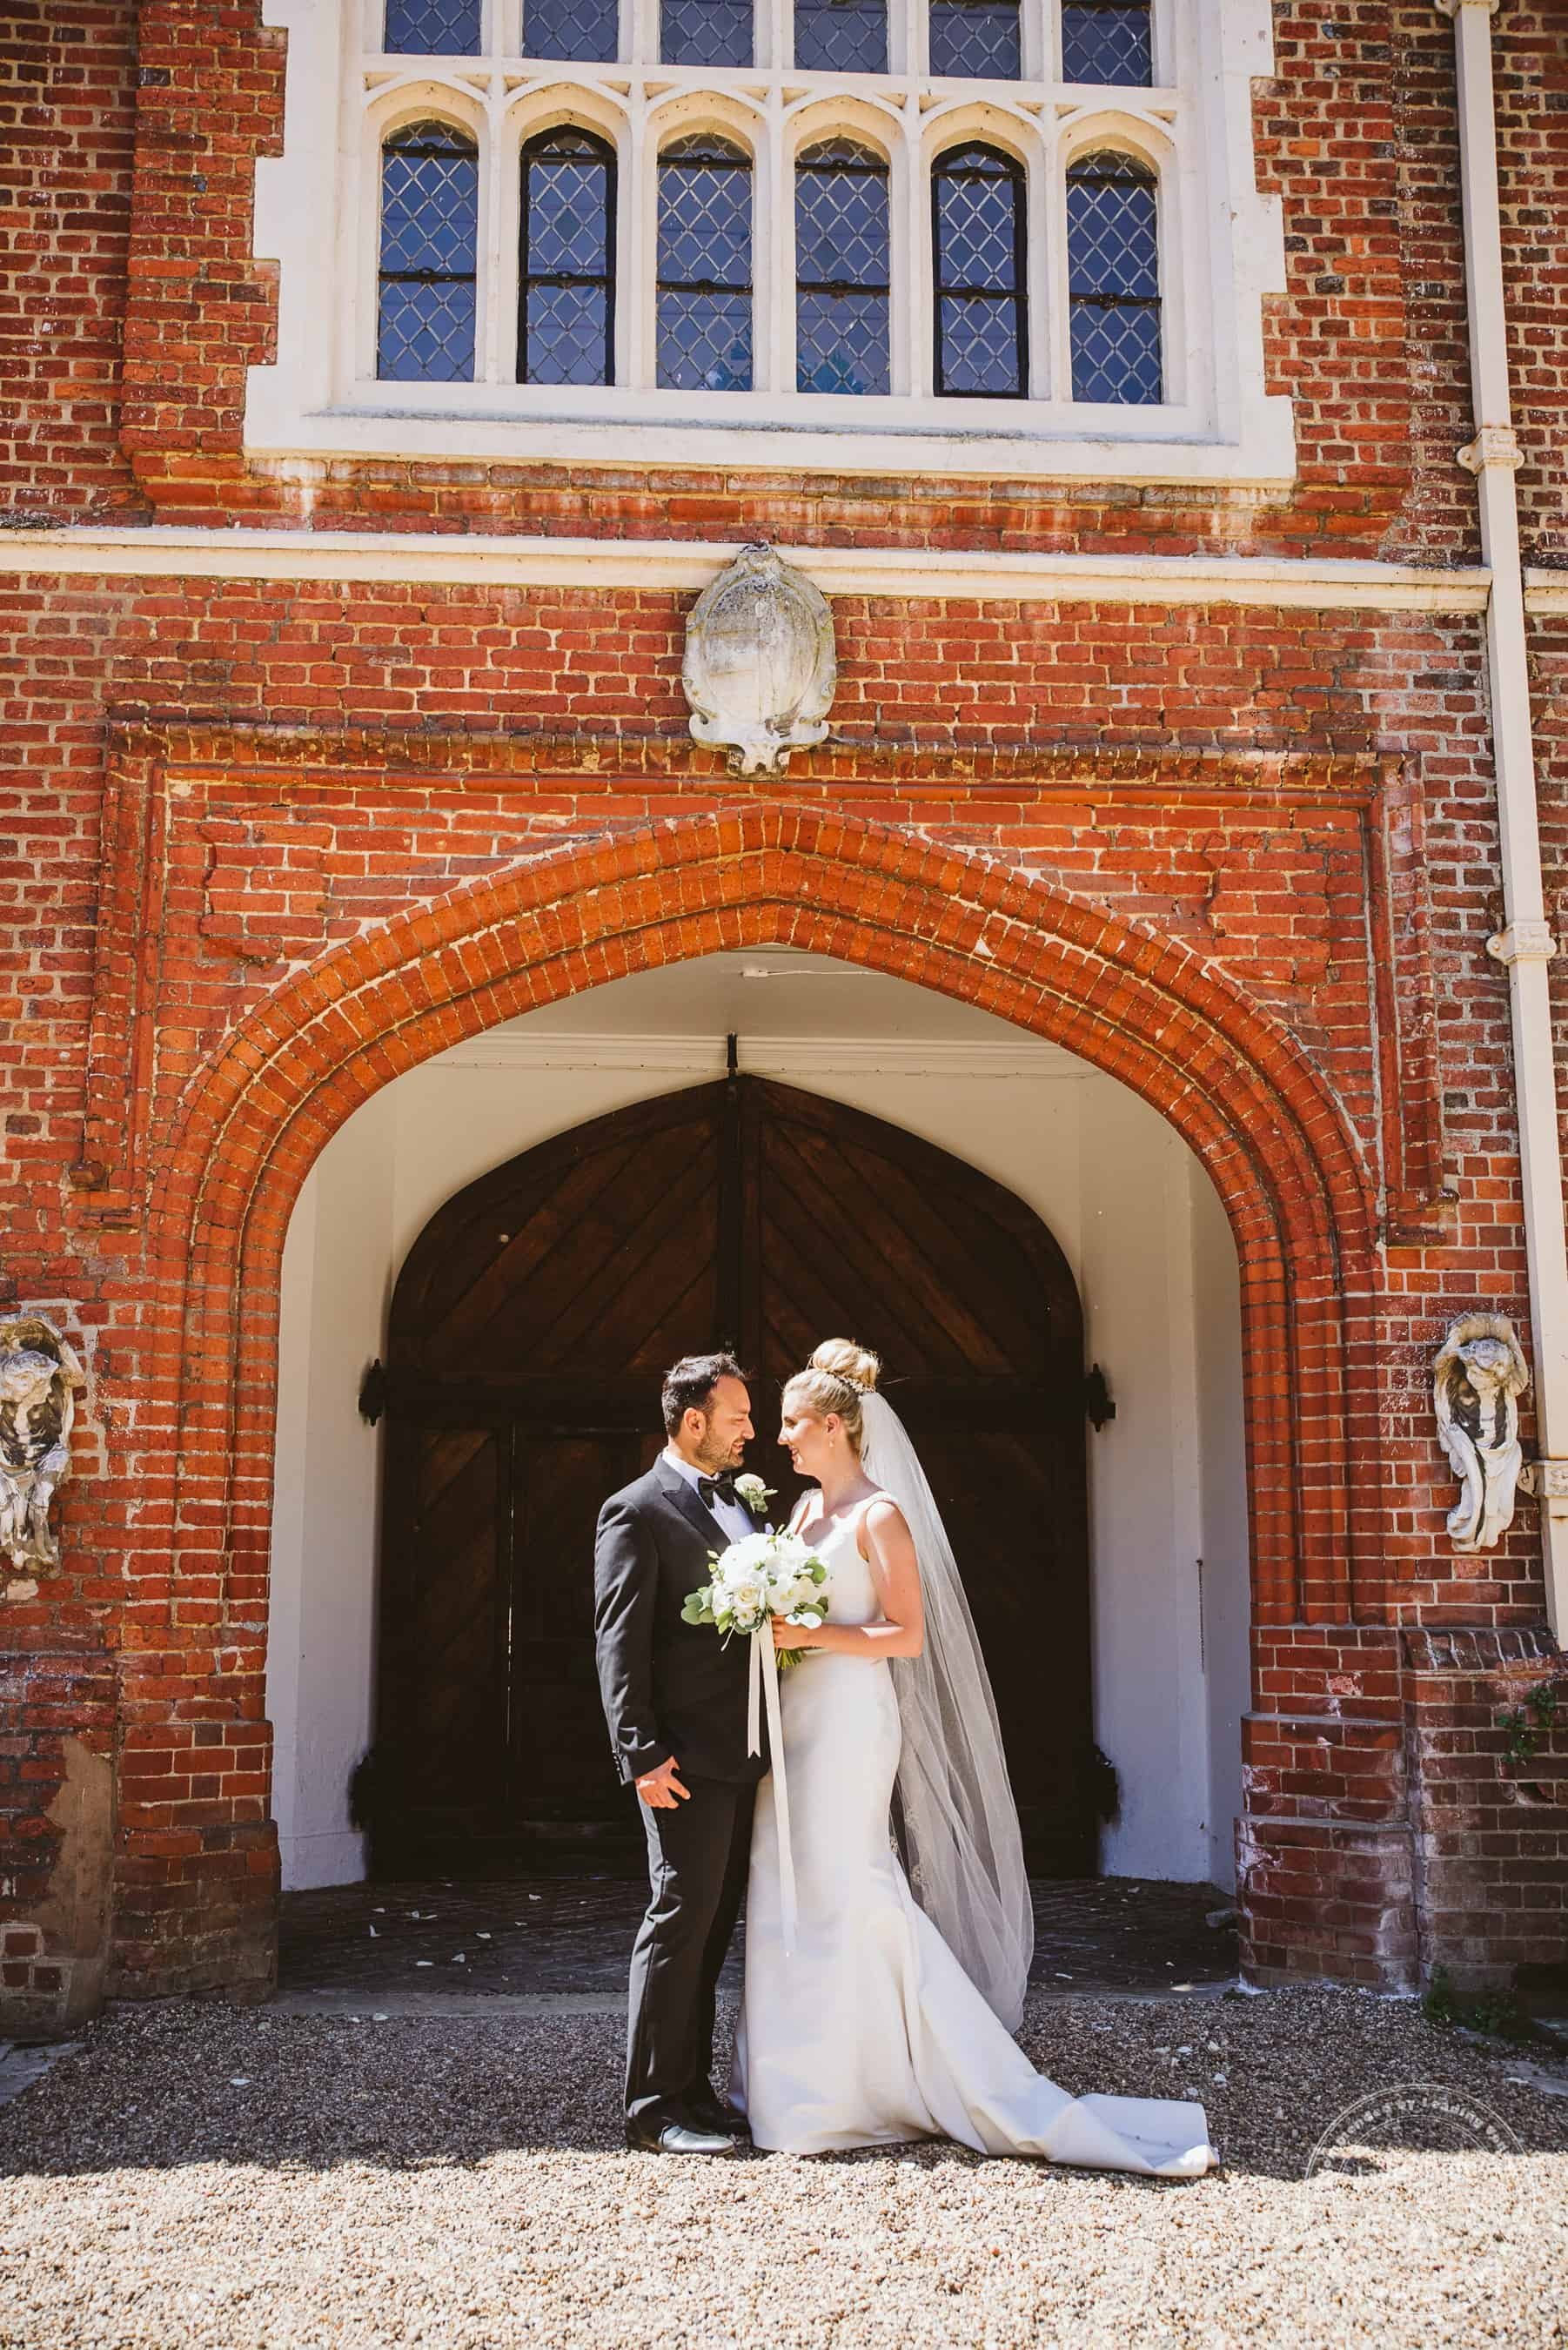 220618 Gosfield Hall Wedding Photography Lavenham Photographic 0110